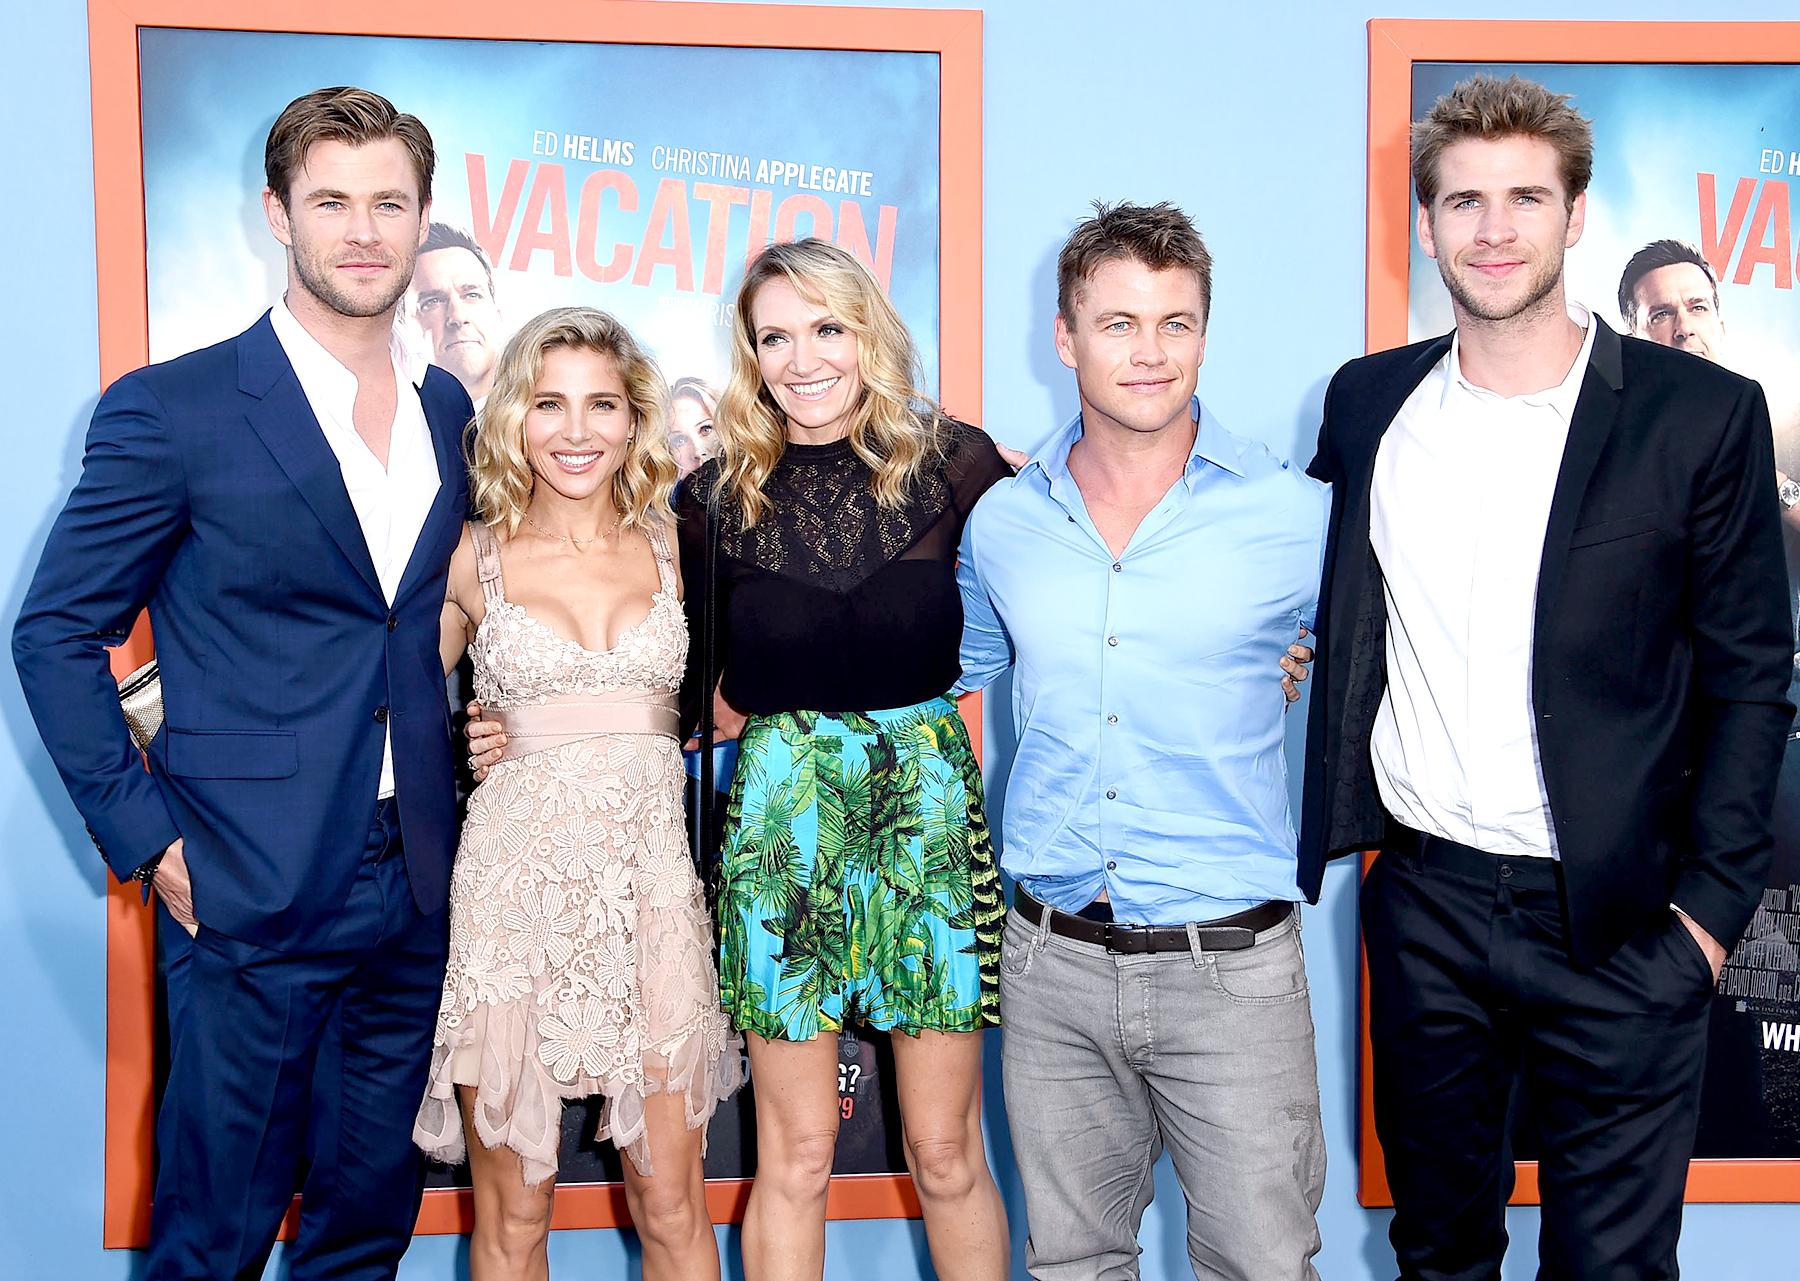 Chris Hemsworth, Elsa Pataky, Samantha Hemsworth, Luke Hemsworth and Liam Hemsworth arrives at the Premiere Of Warner Bros.